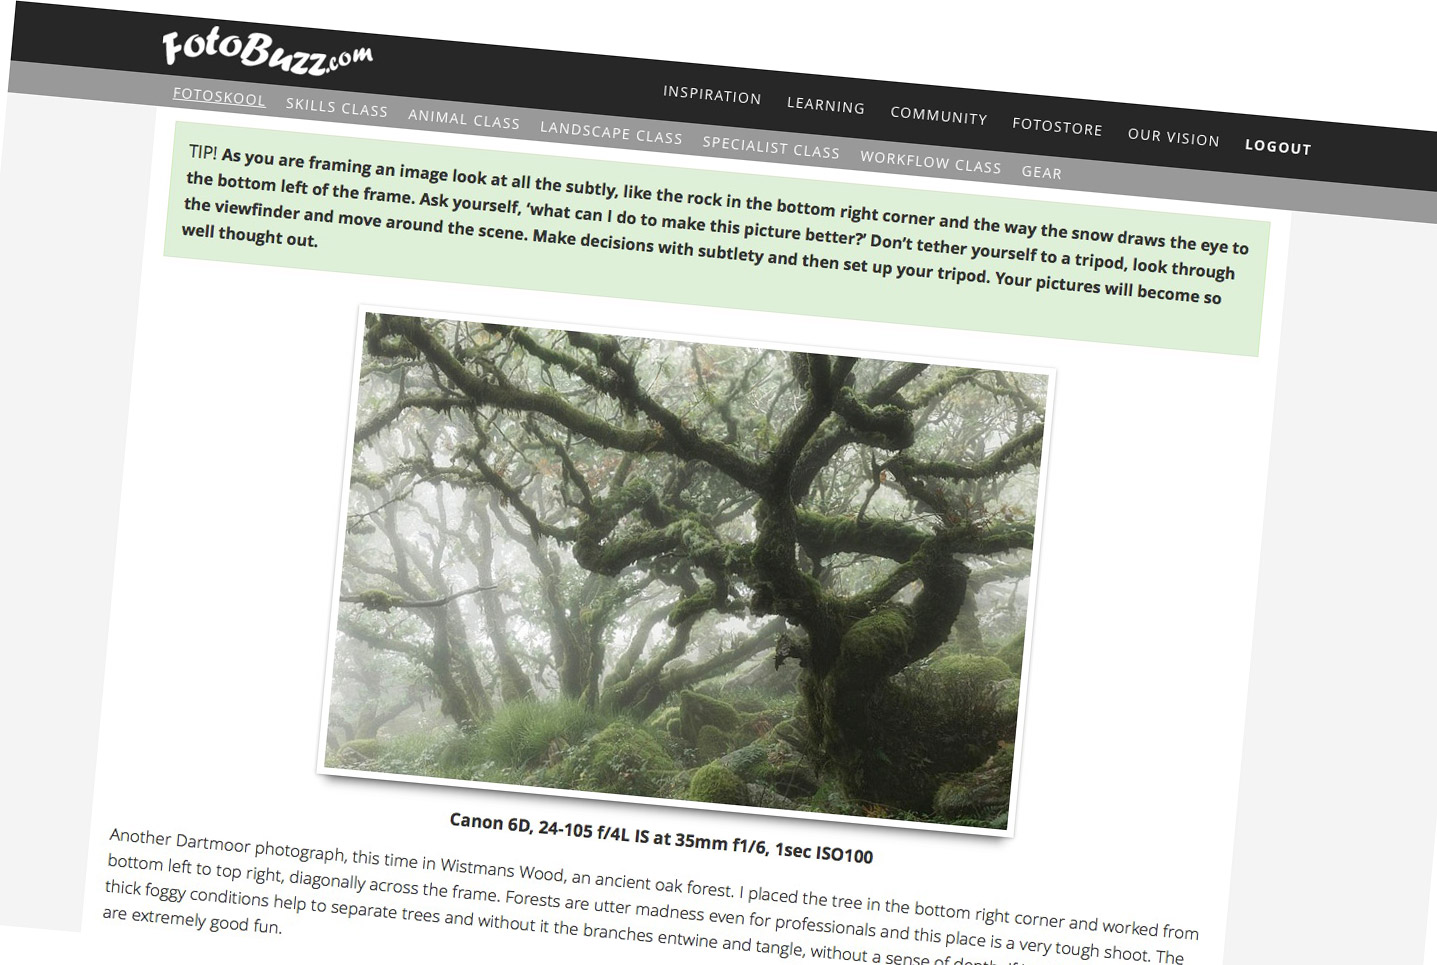 Fotobuzz - New Articles